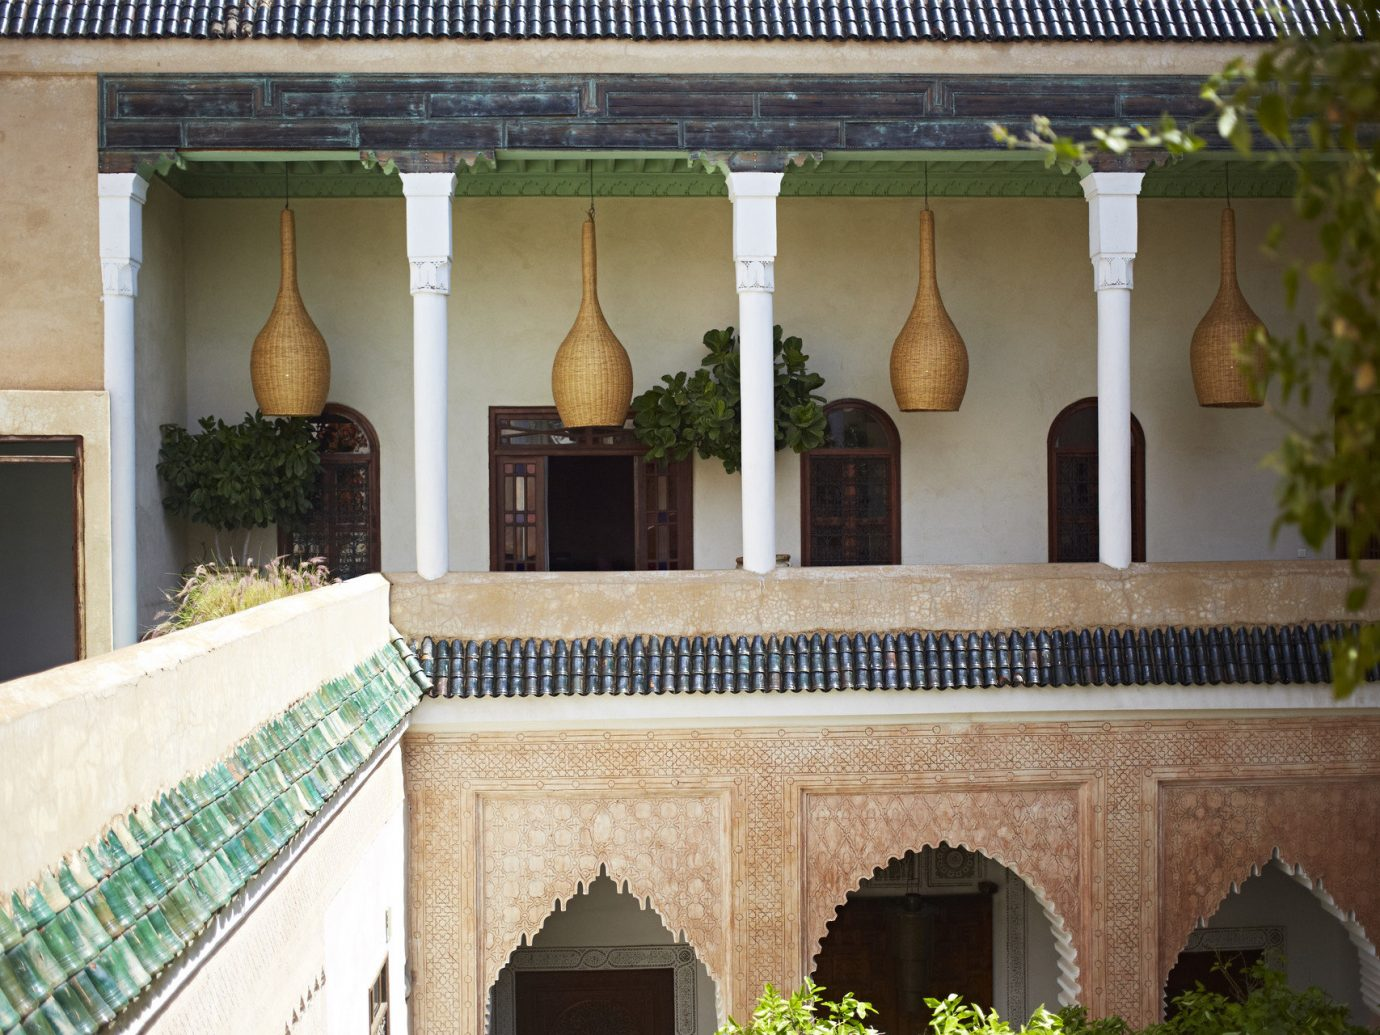 Arts + Culture Marrakech Morocco Style + Design outdoor property building house Architecture Courtyard hacienda Villa baluster estate palace facade home mansion interior design window arch stone